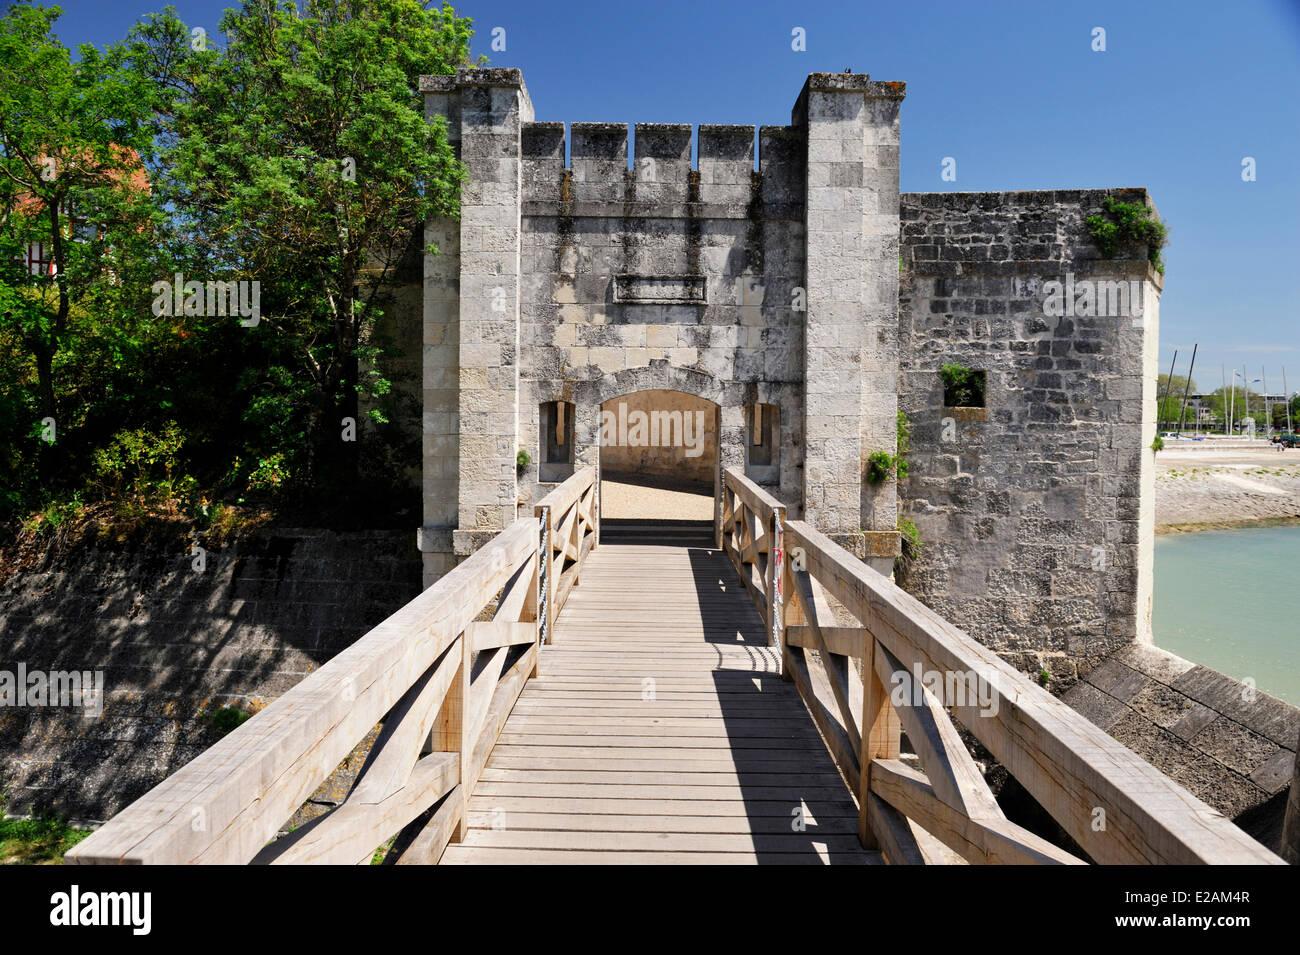 France, Charente Maritime, La Rochelle, fortification, Plage de la Concurence (Concurrence Beach) - Stock Image